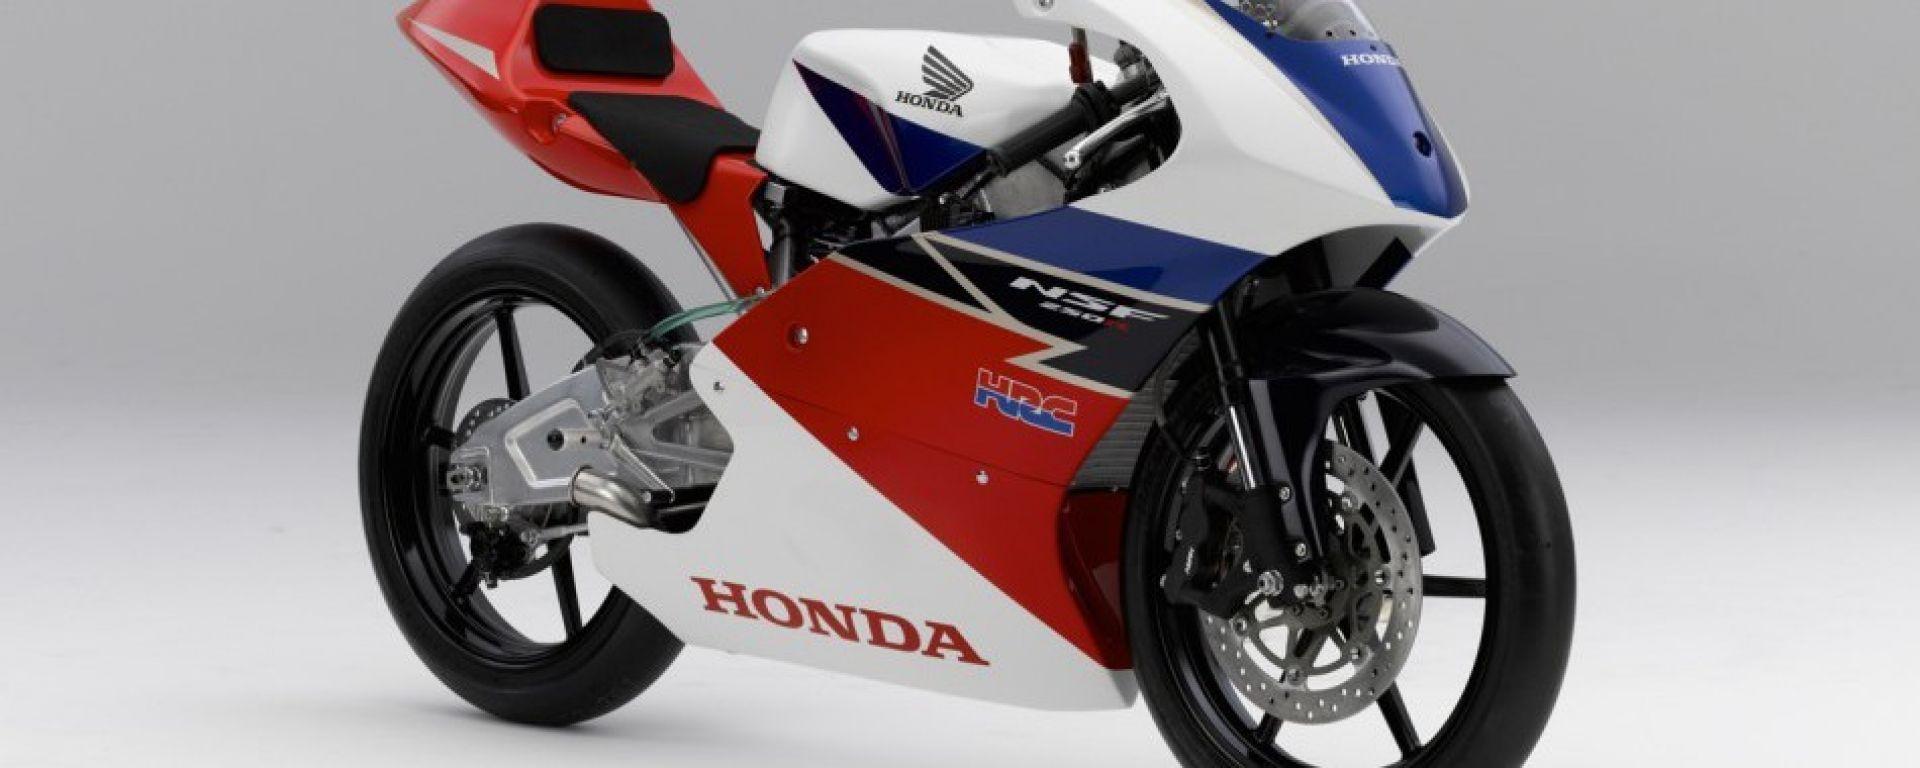 Honda svela ufficialmente la NSF250R Moto3